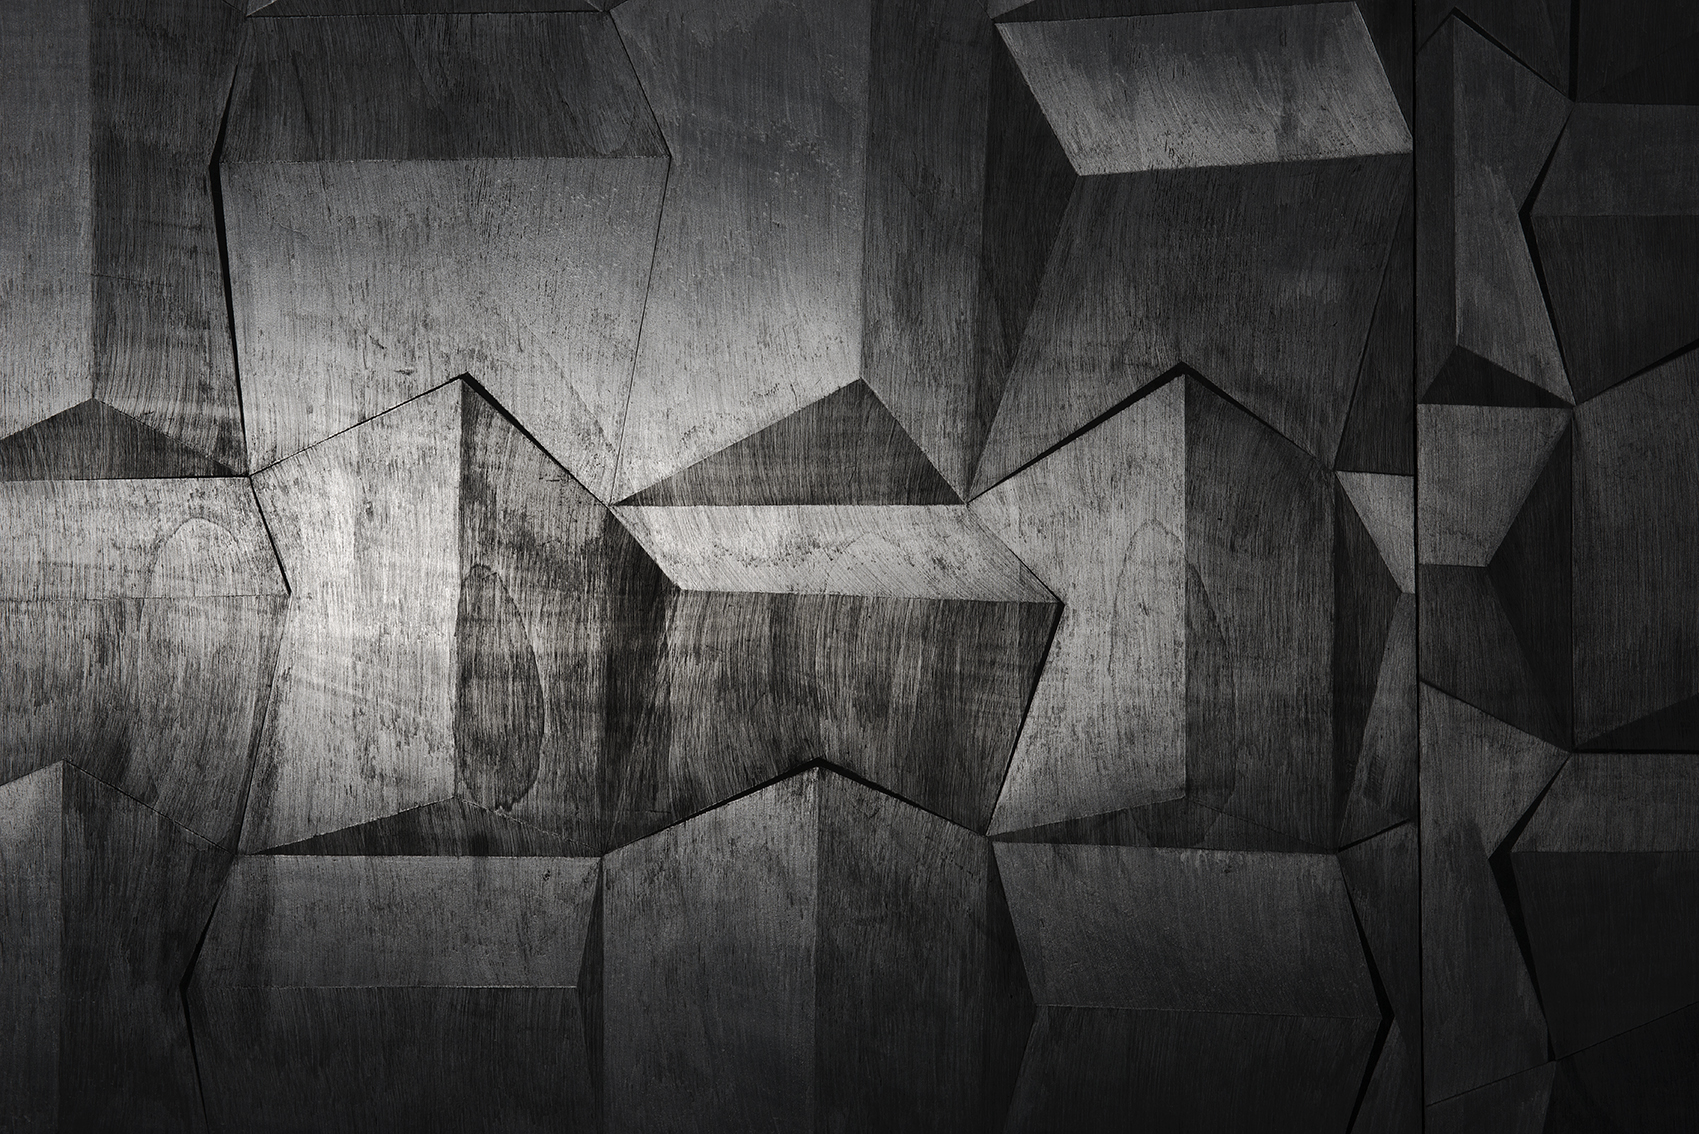 Hado, פחם וגרפיט על עץ, פרט מתוך מיצב, 2014 (3).jpg